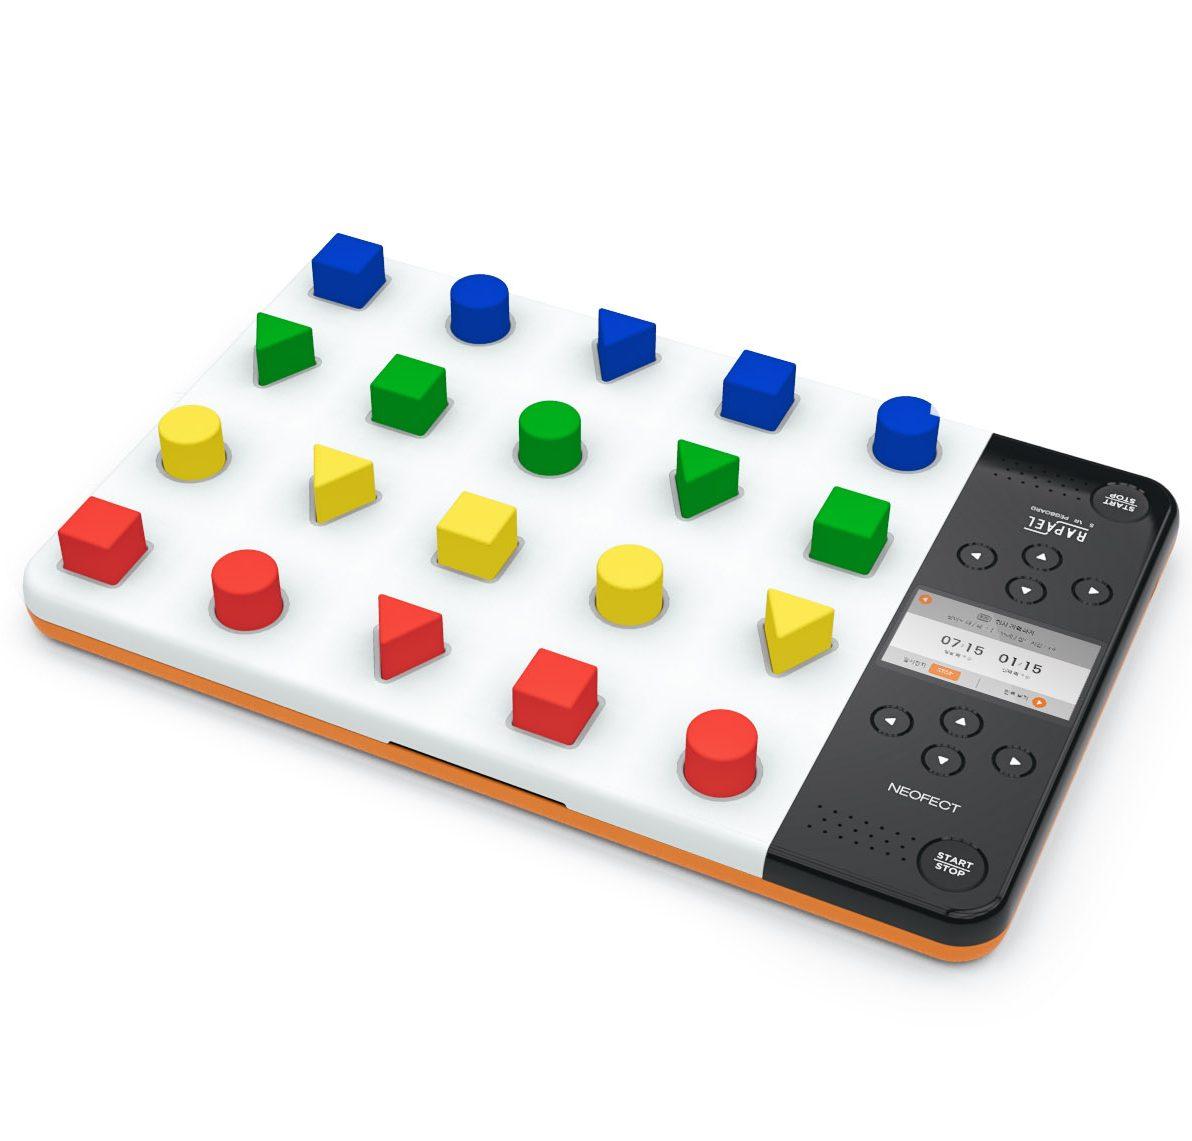 Neofect Smart Pegboard mit verschiedenen Formen